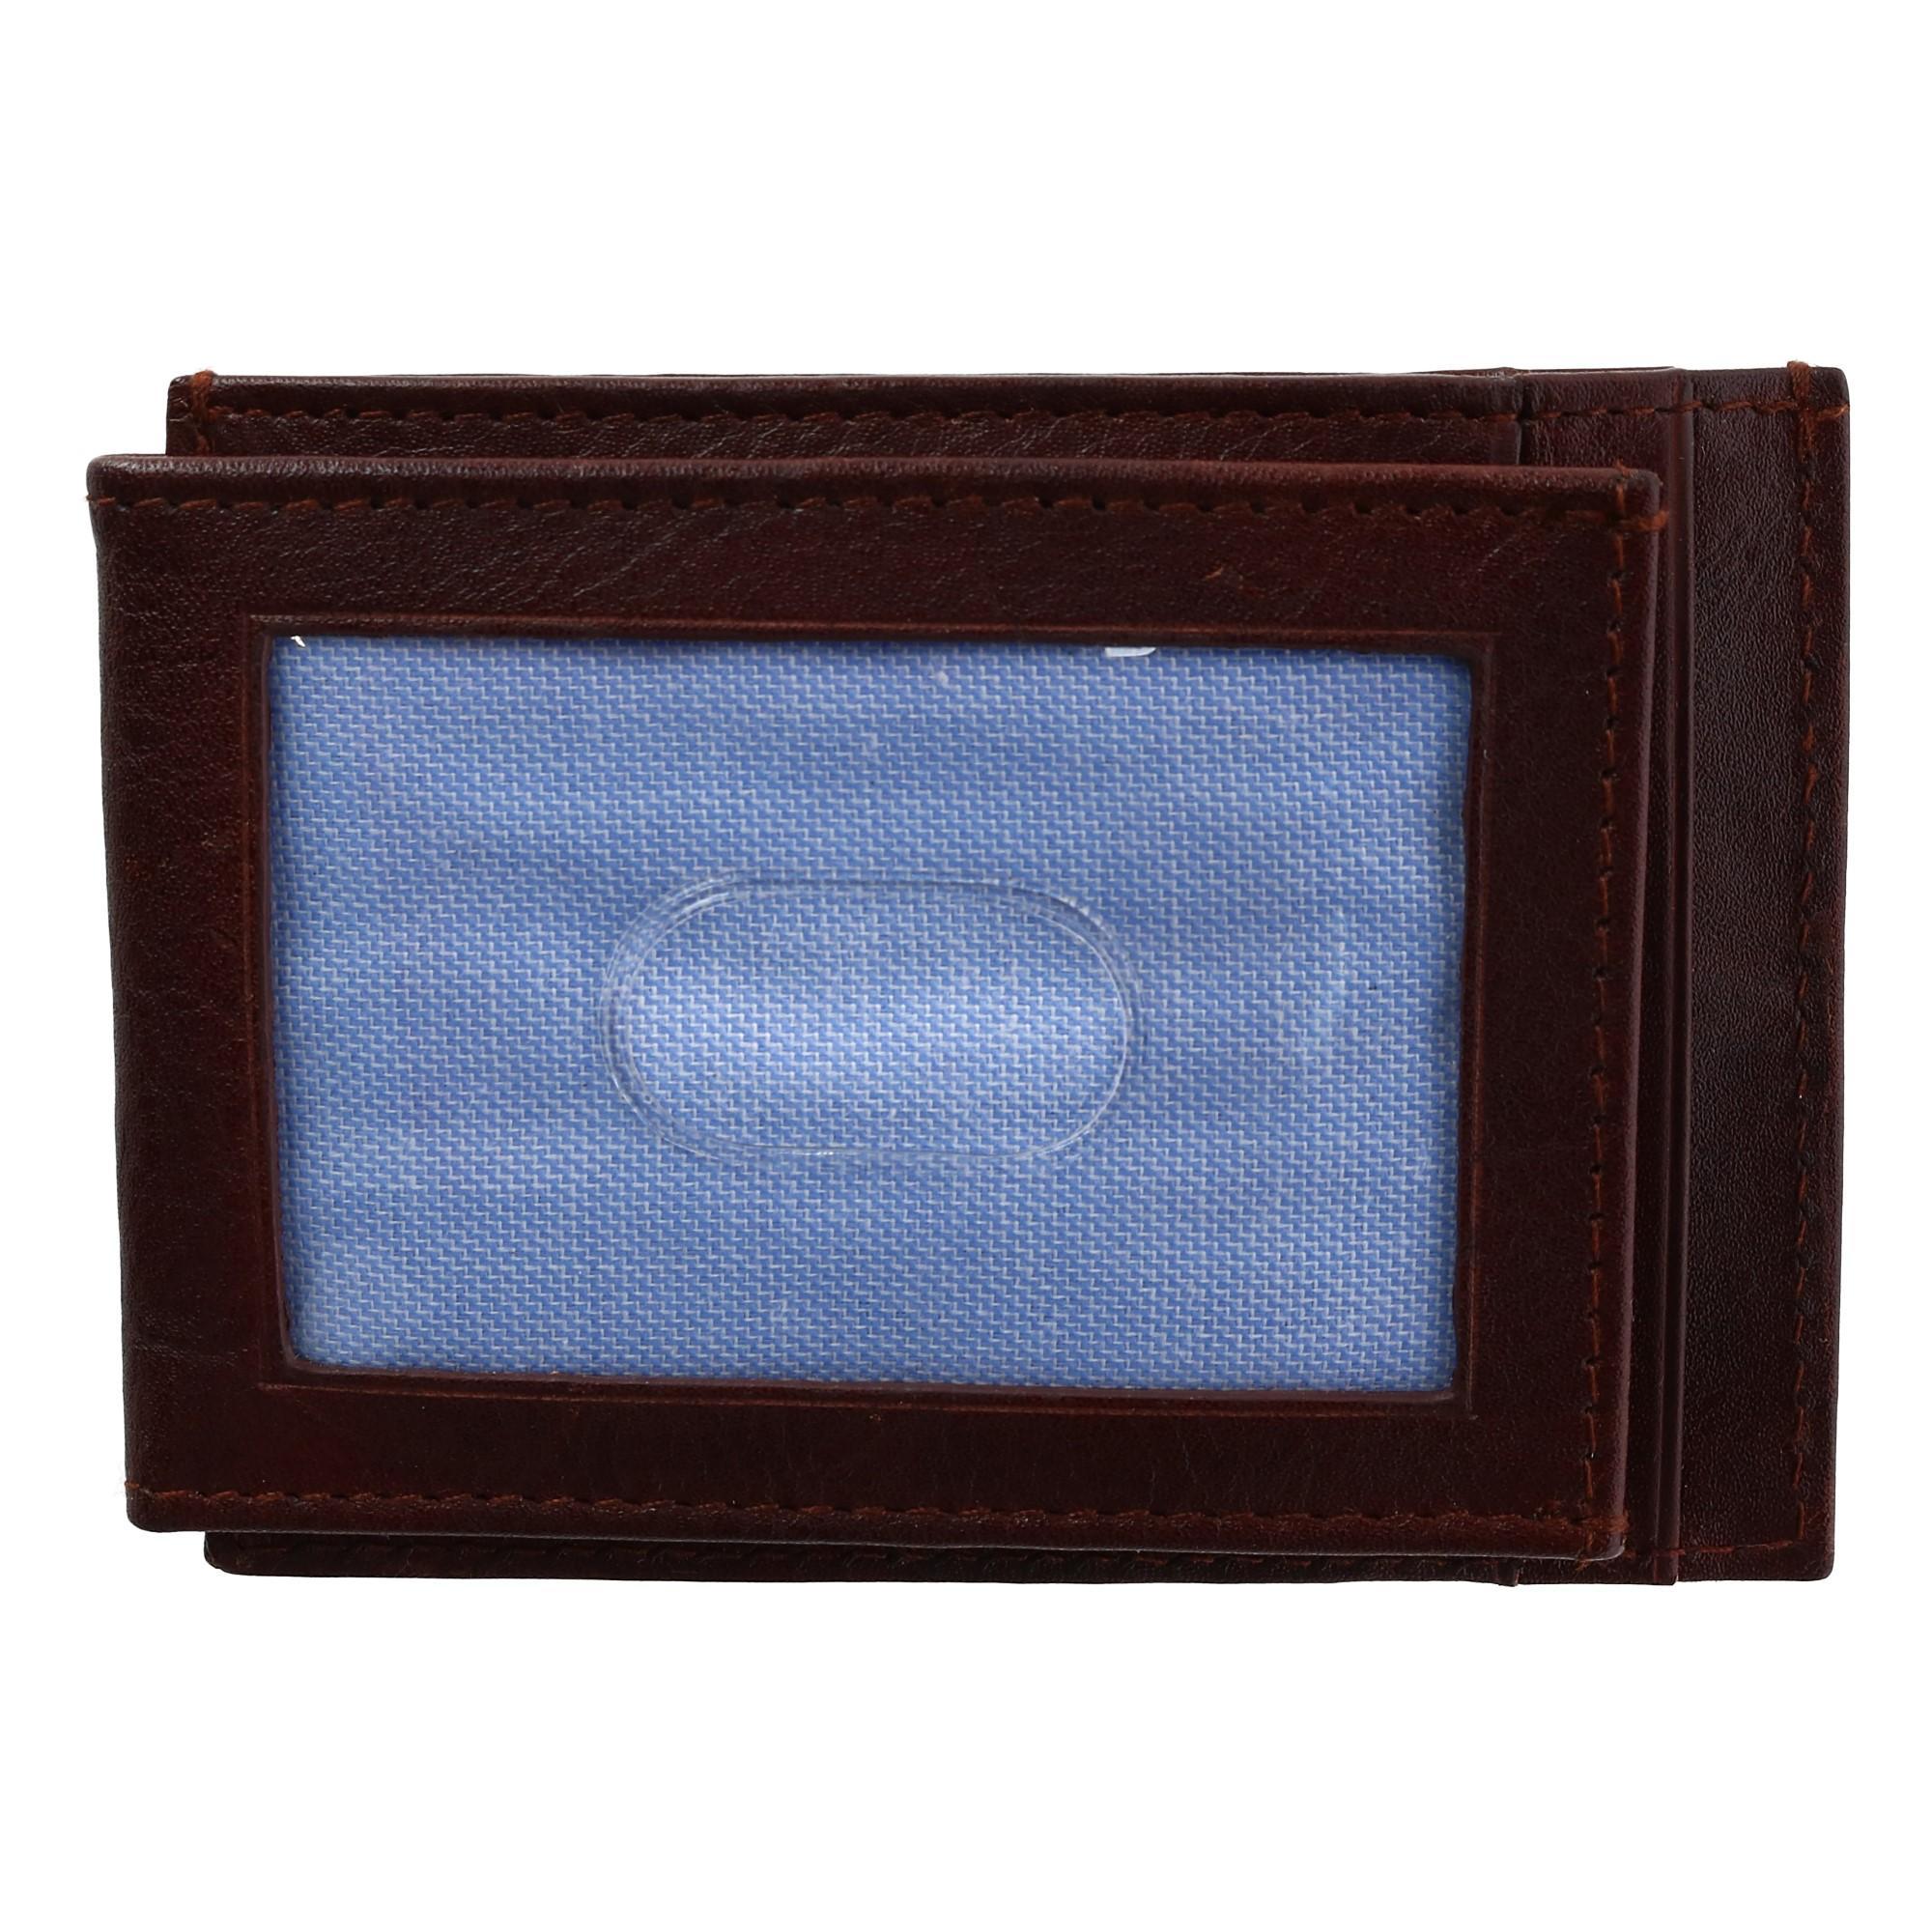 Tommy Hilfiger Men's Leather York Front Pocket Wallet With Magnetic Money Clip